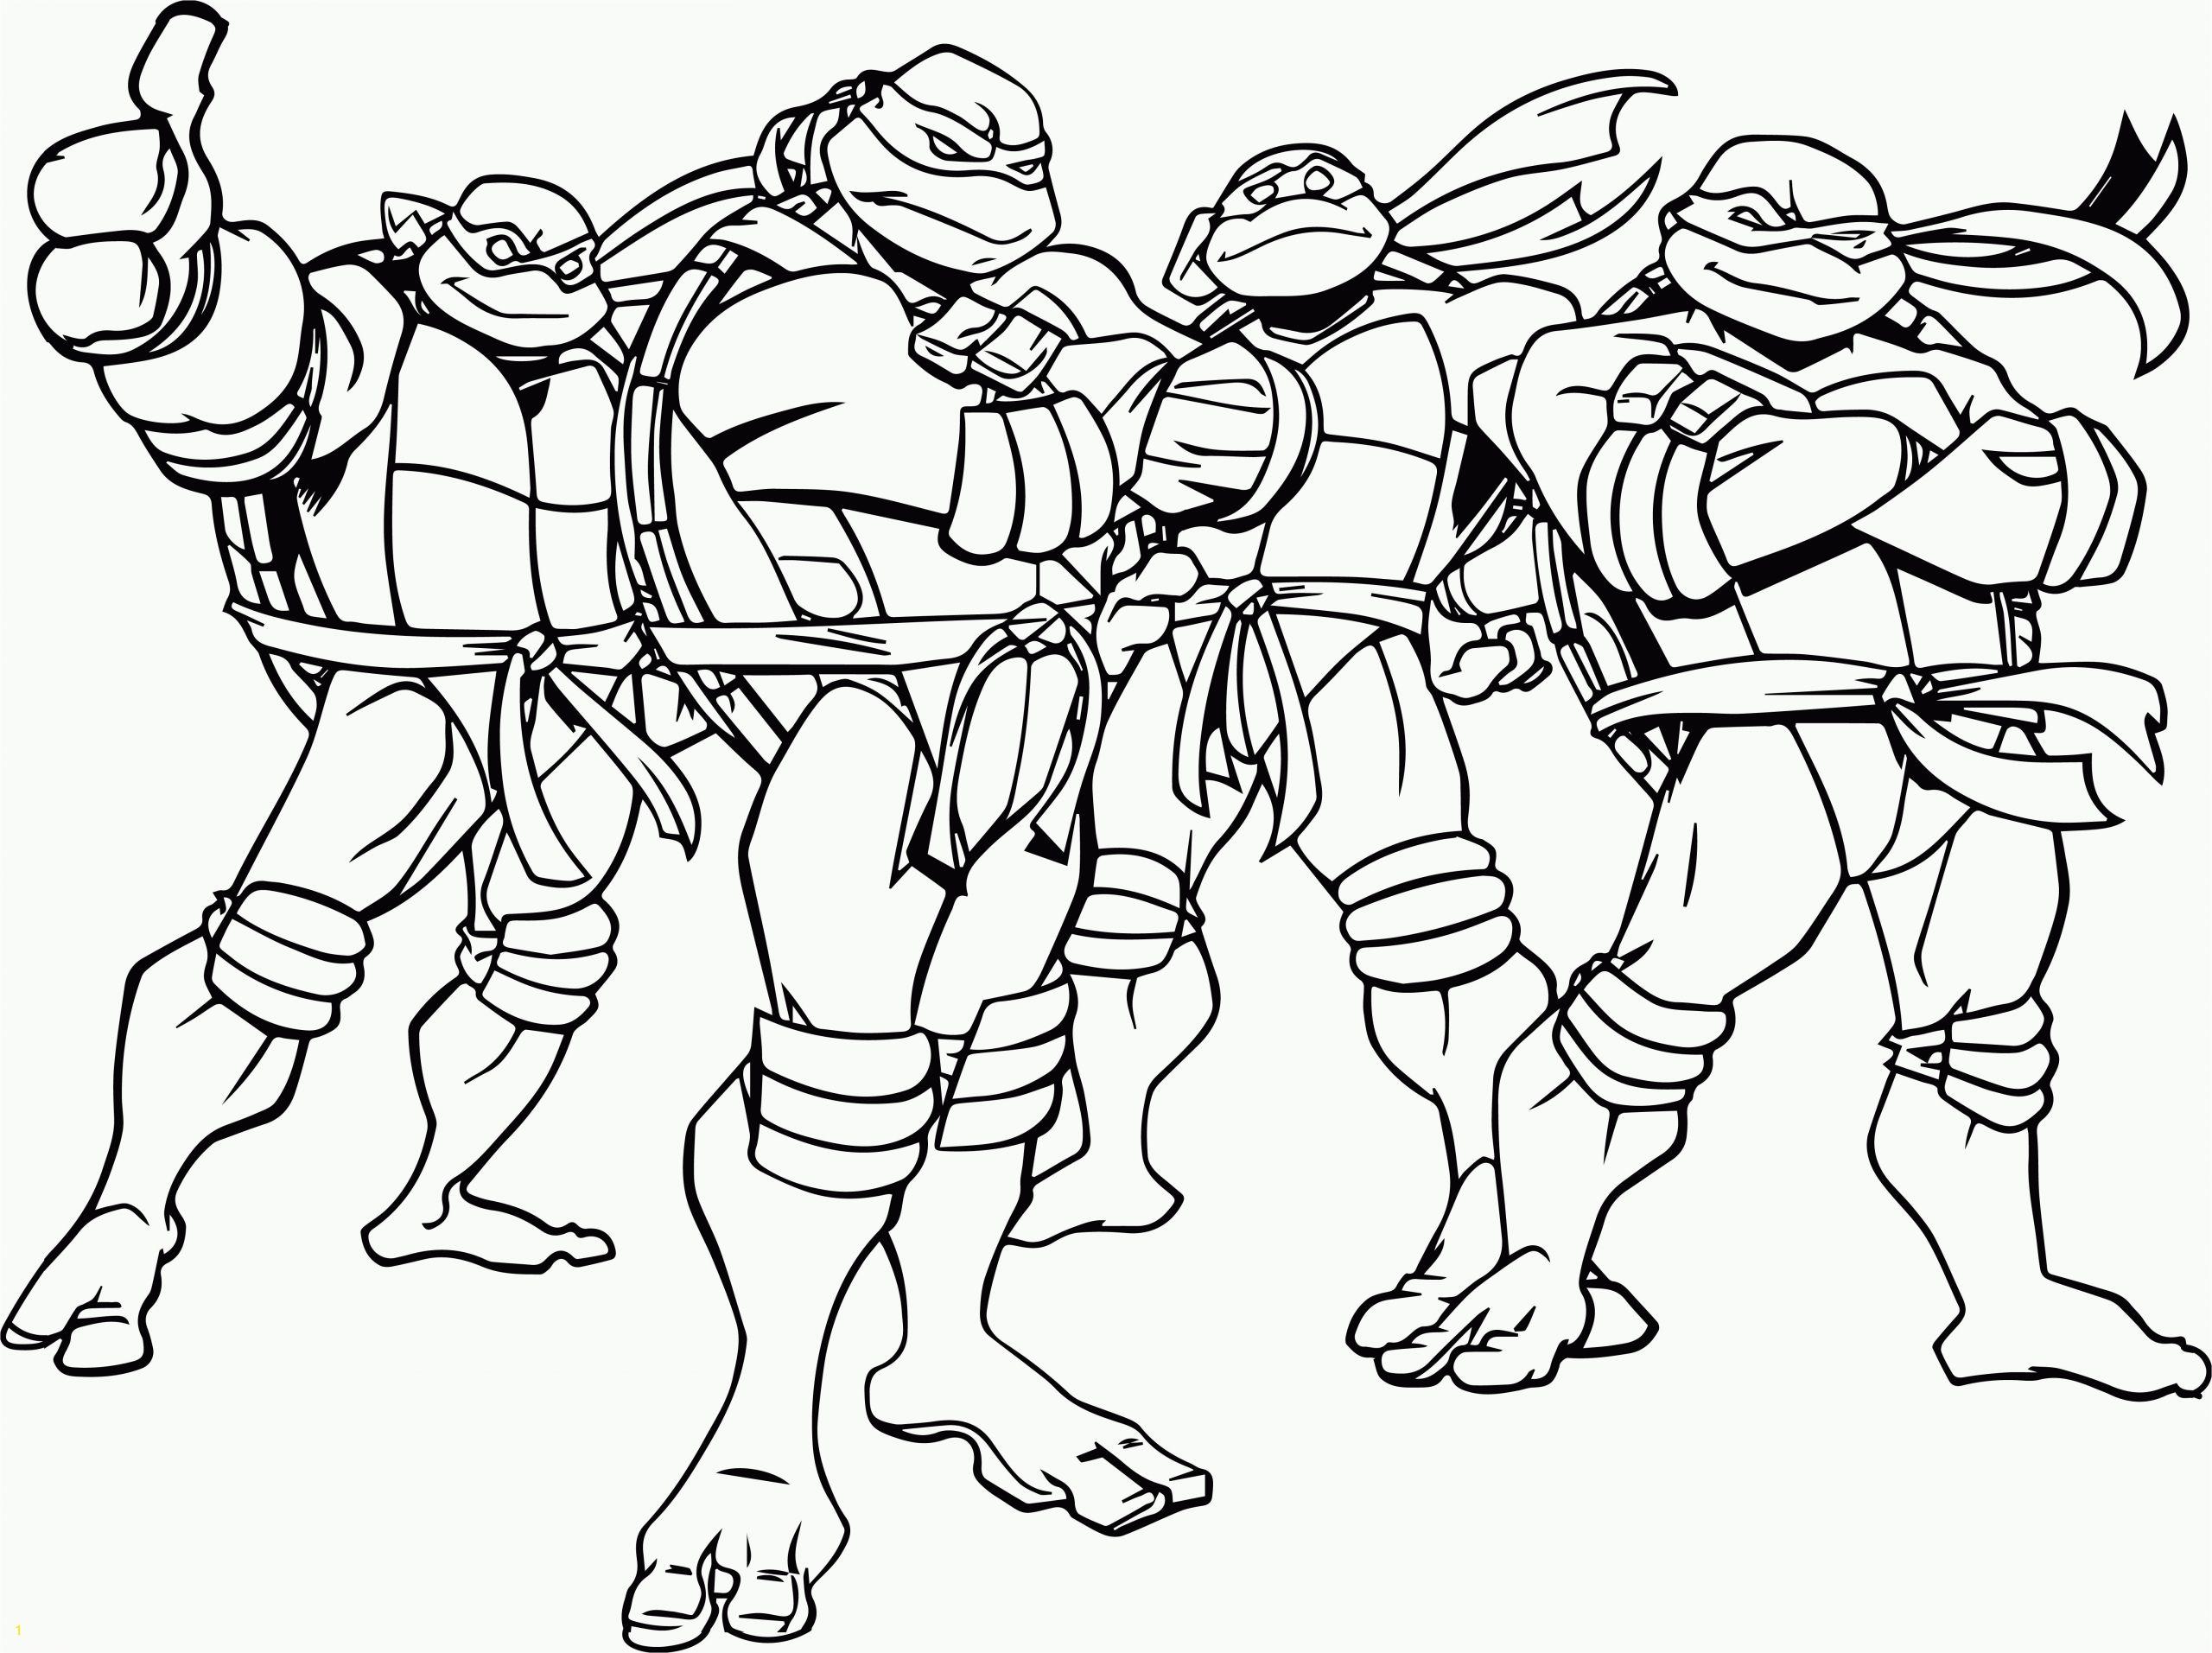 Free Printable Coloring Pages Of Ninja Turtles Best Free Printable Ninja Turtle Coloring Pages